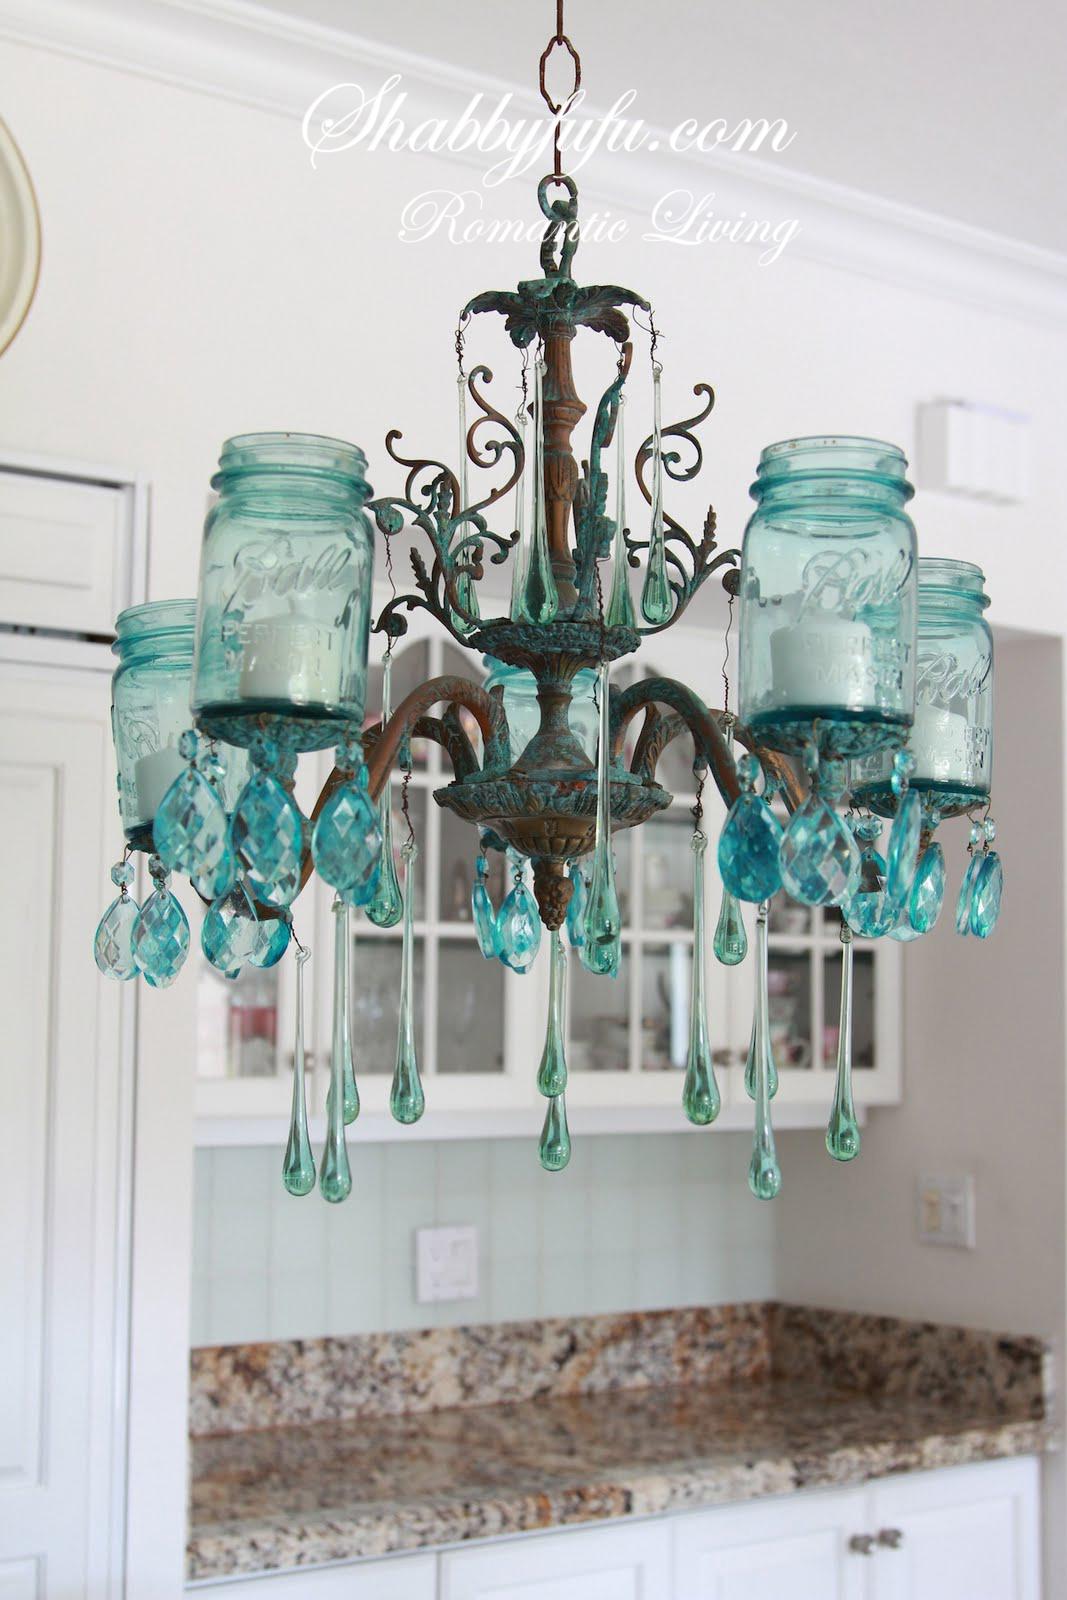 The original shabbyfufu blue mason jar chandelier shabbyfufu the original shabbyfufu blue mason jar chandelier arubaitofo Gallery